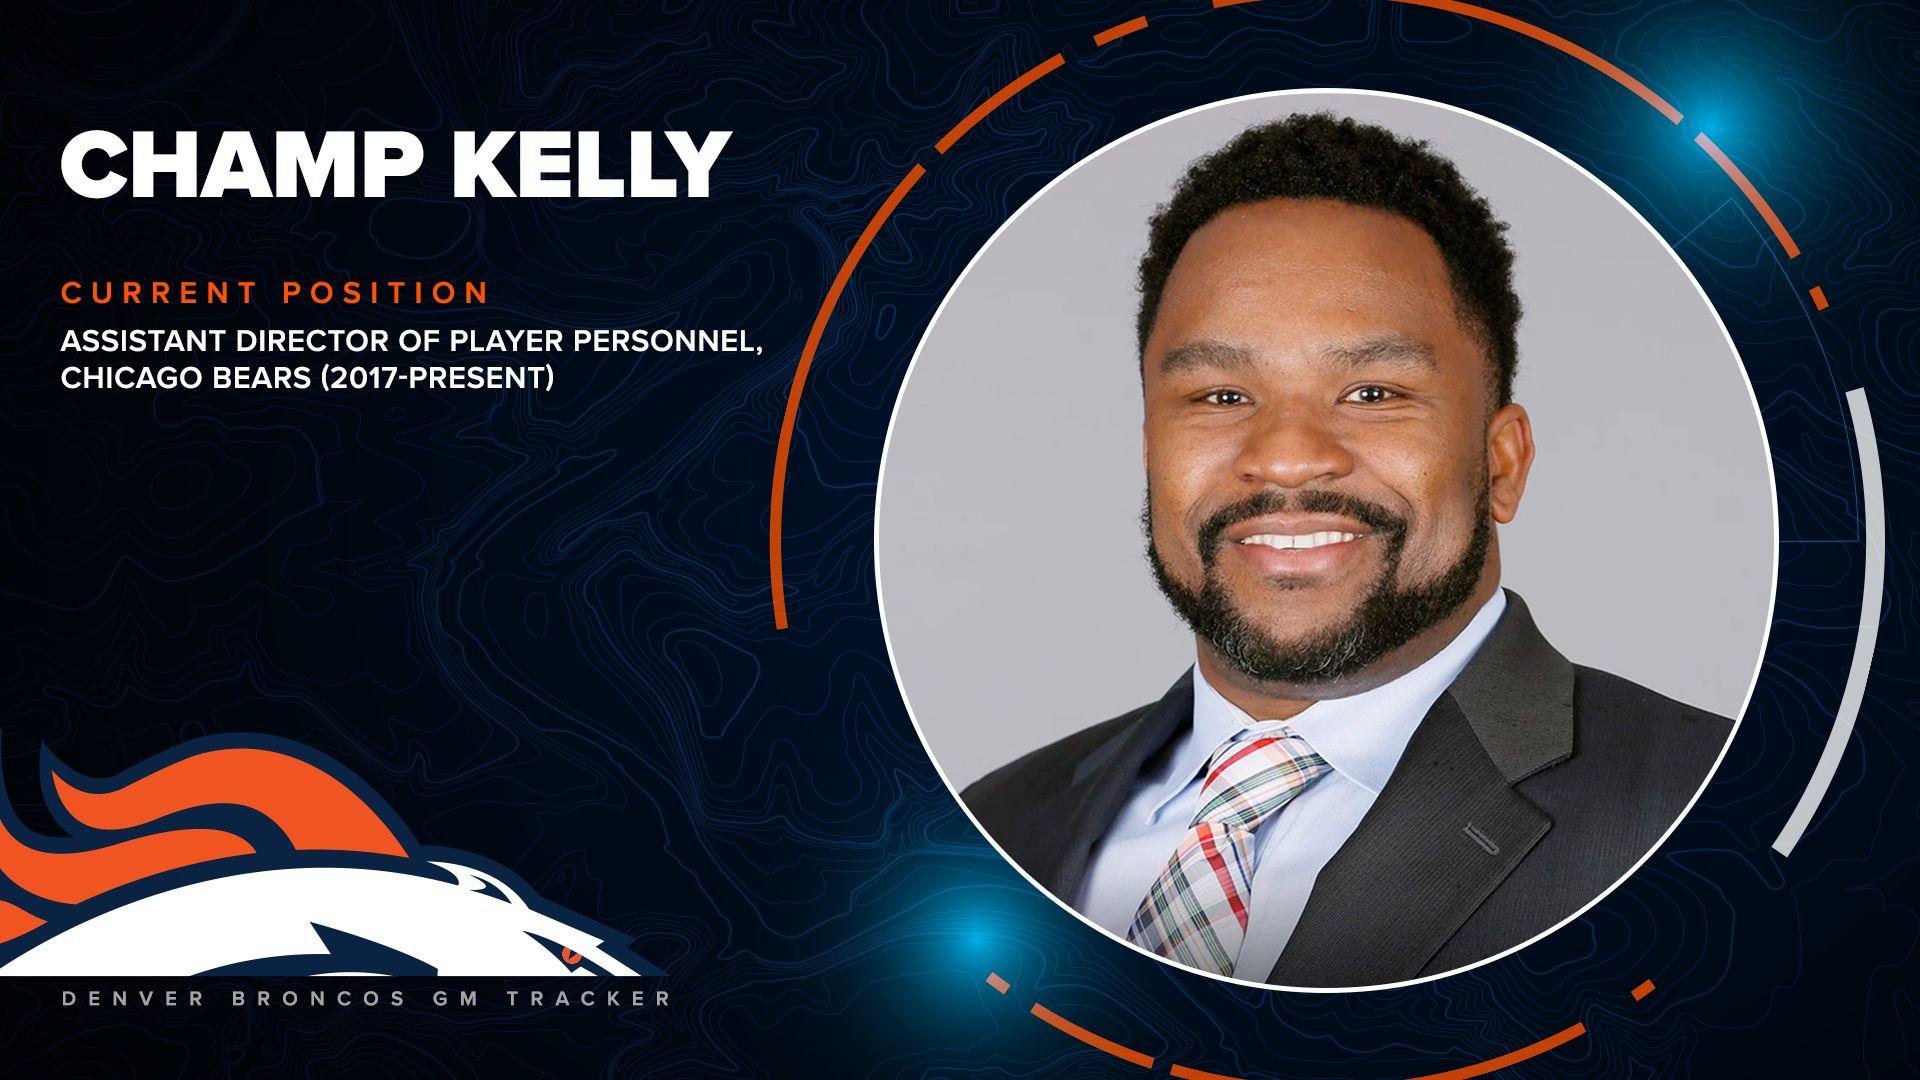 Champ Kelly